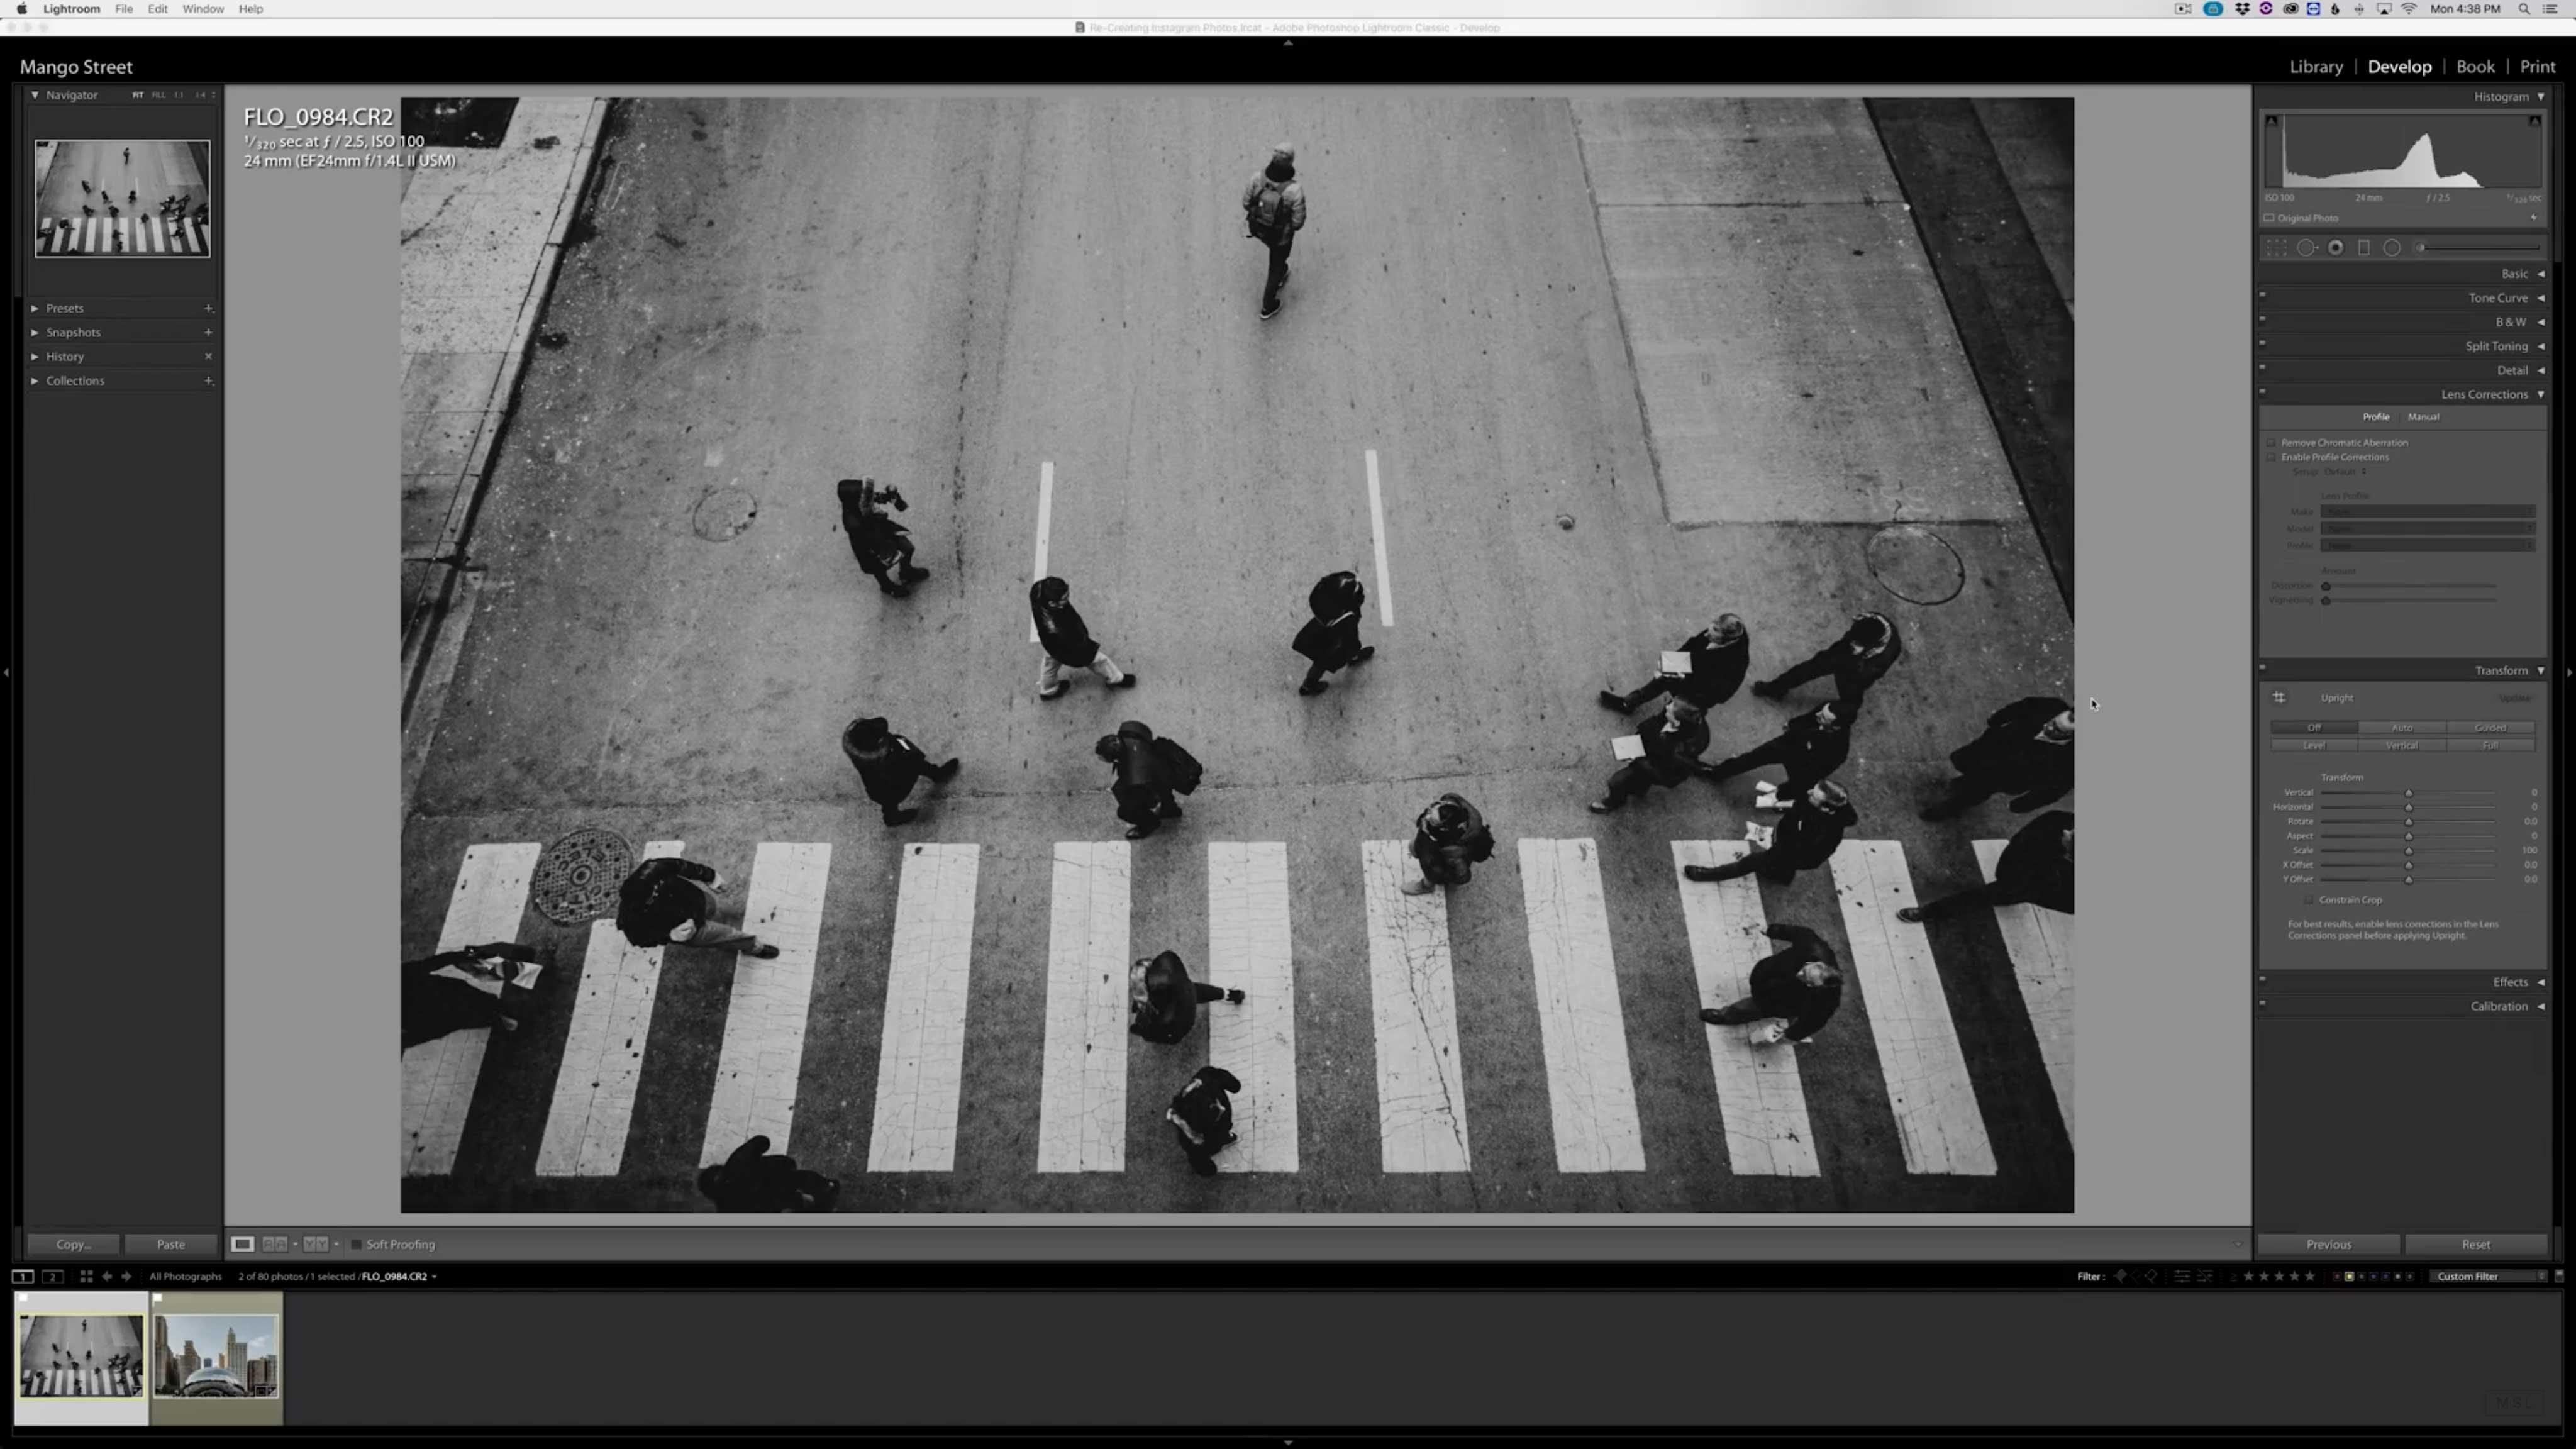 street architecture 1 image